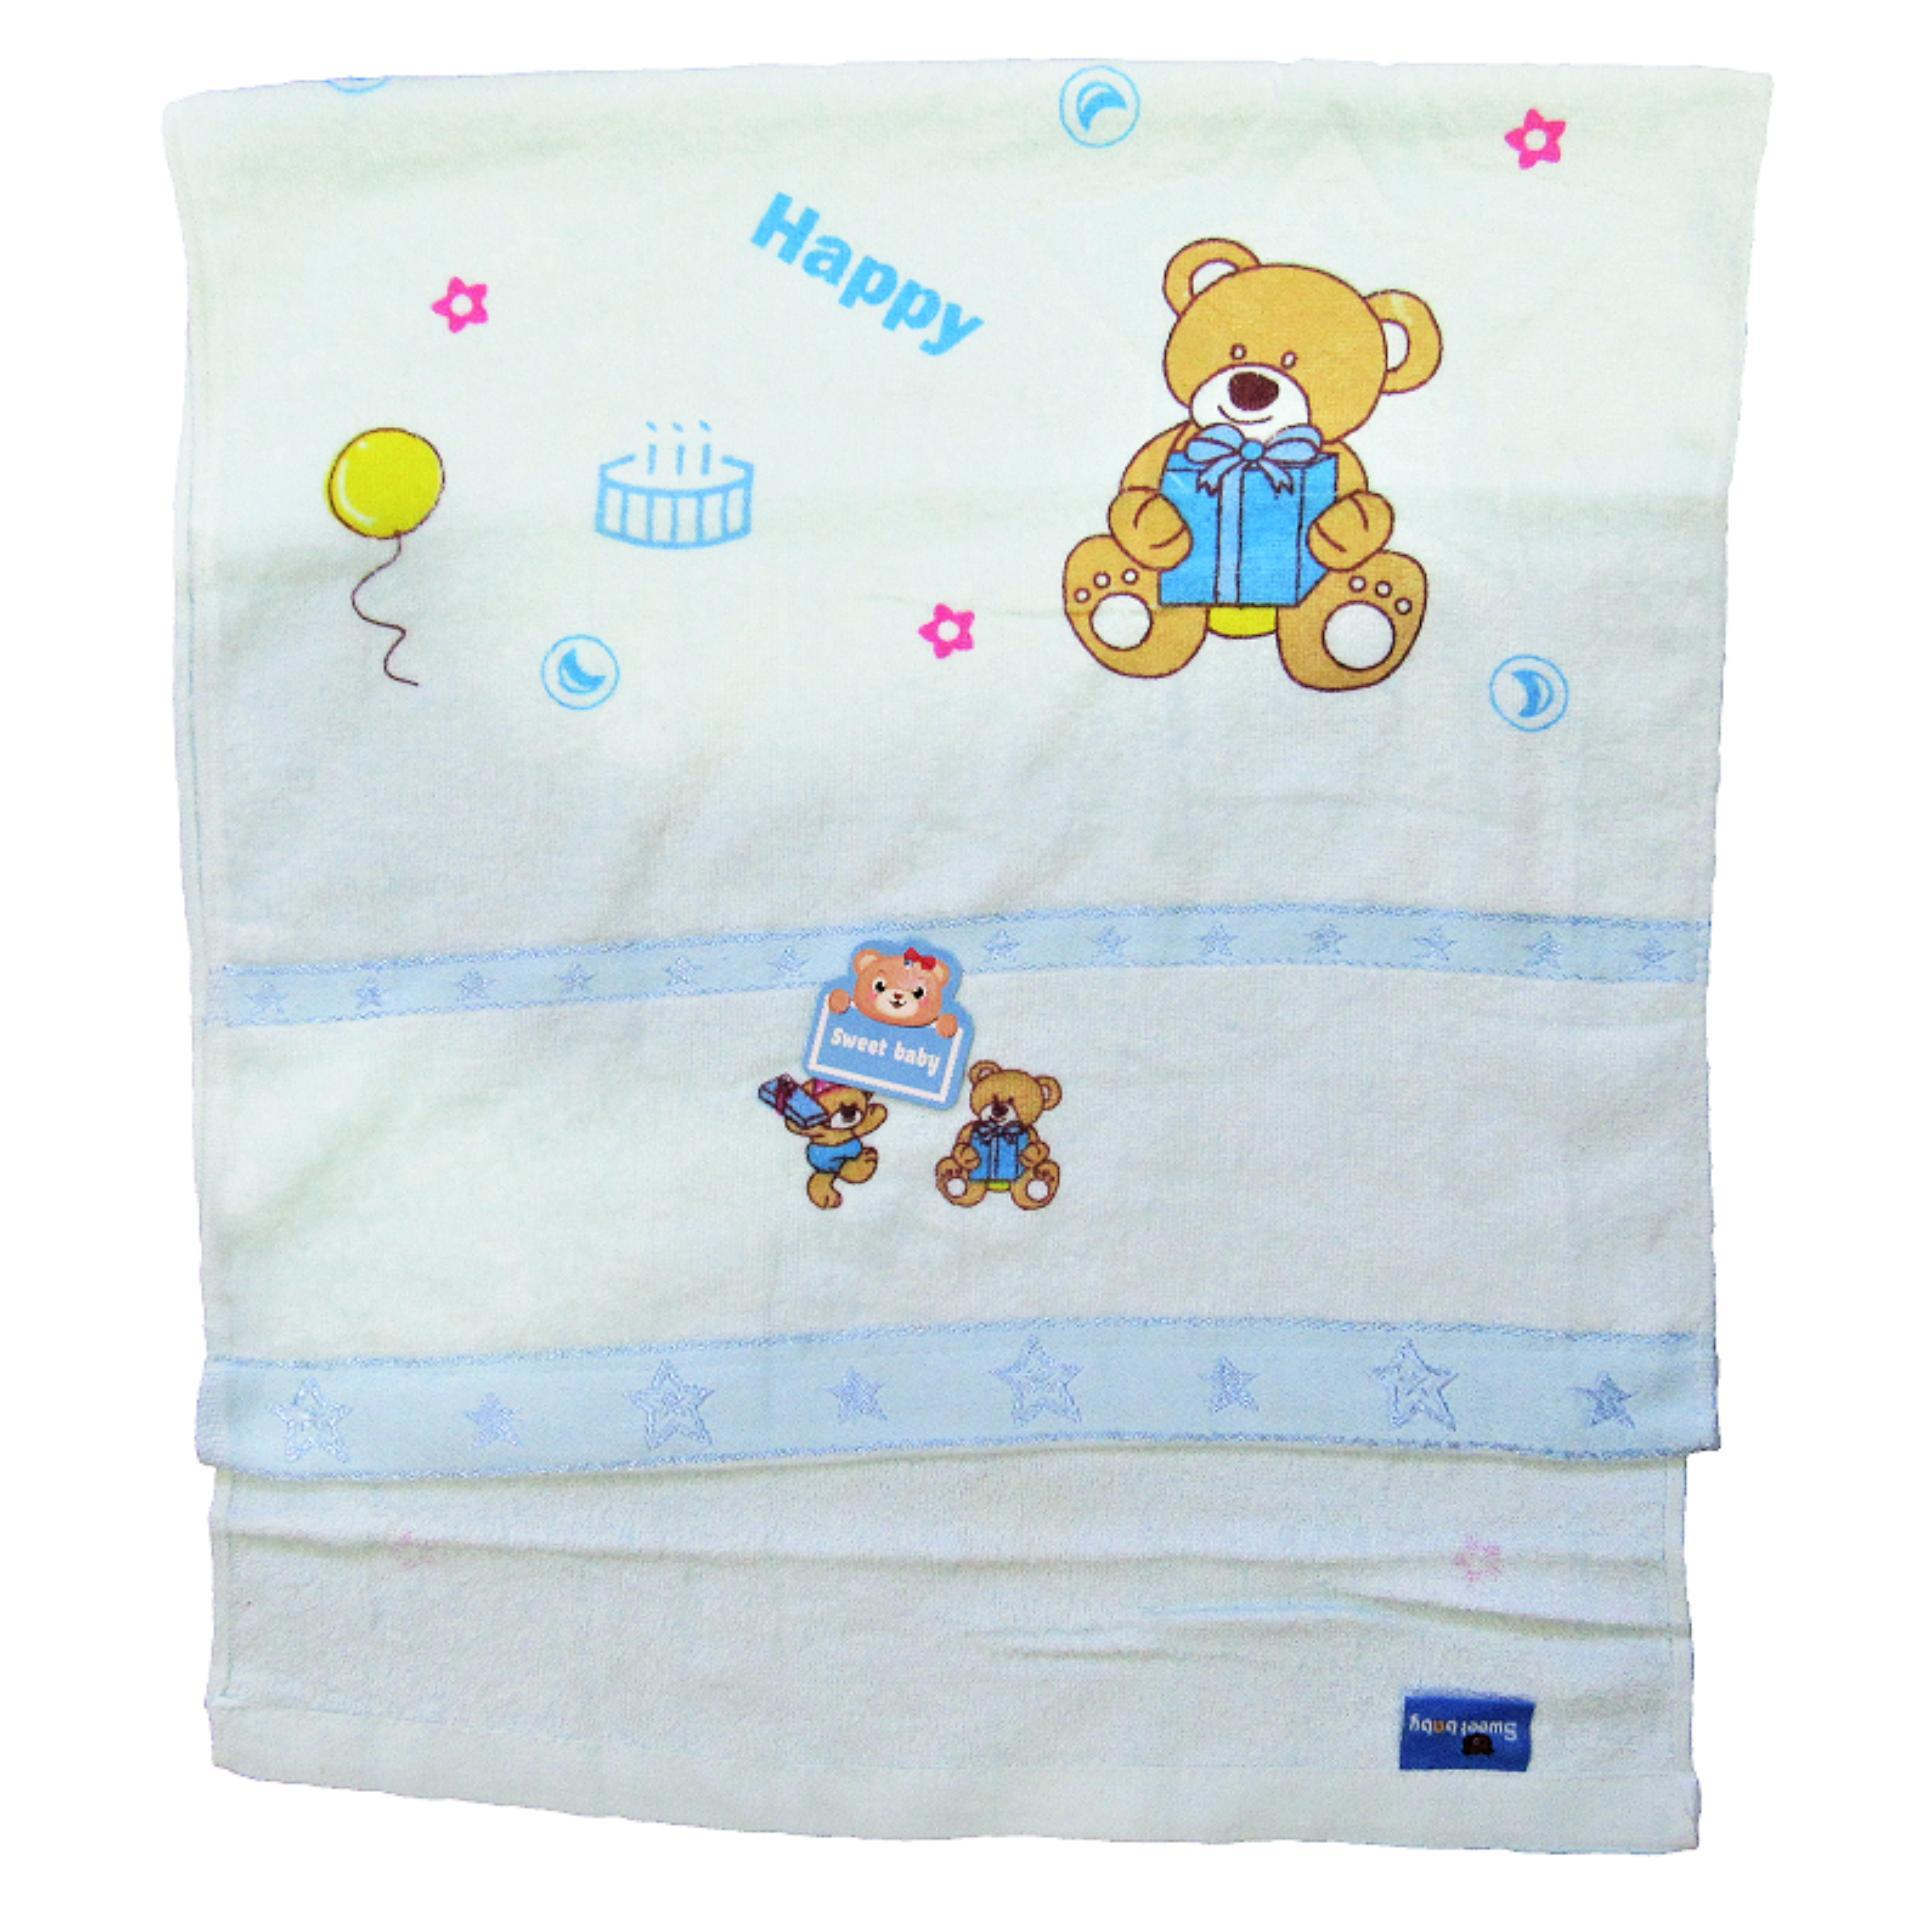 Wulanda handuk mandi bayi warna ukuran 50 X 100 cm